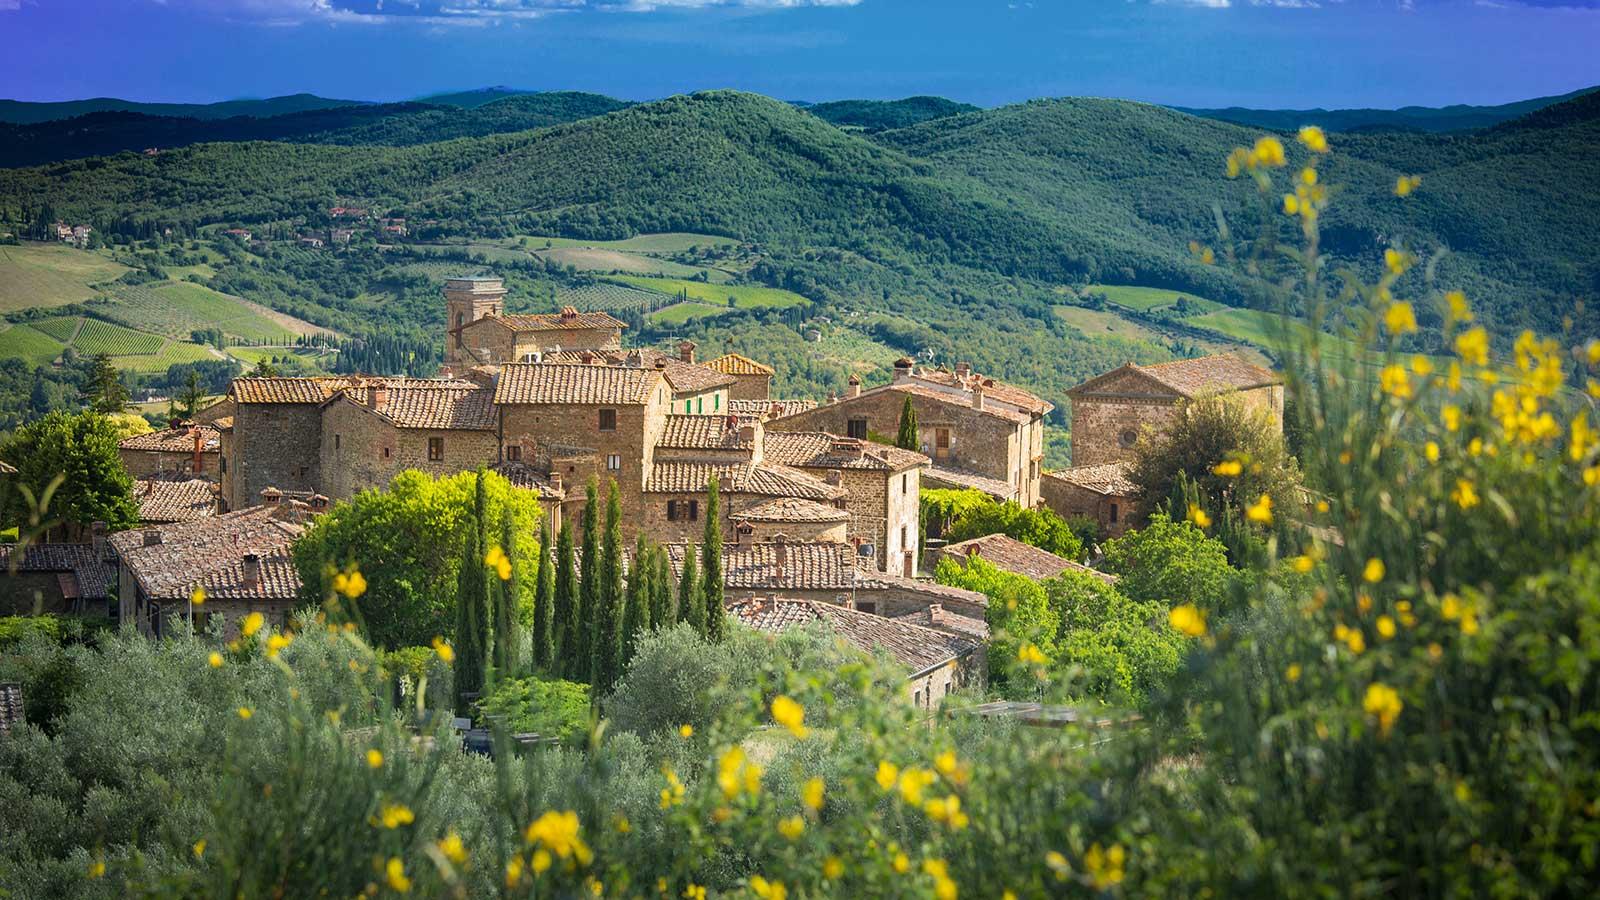 image of vineyard